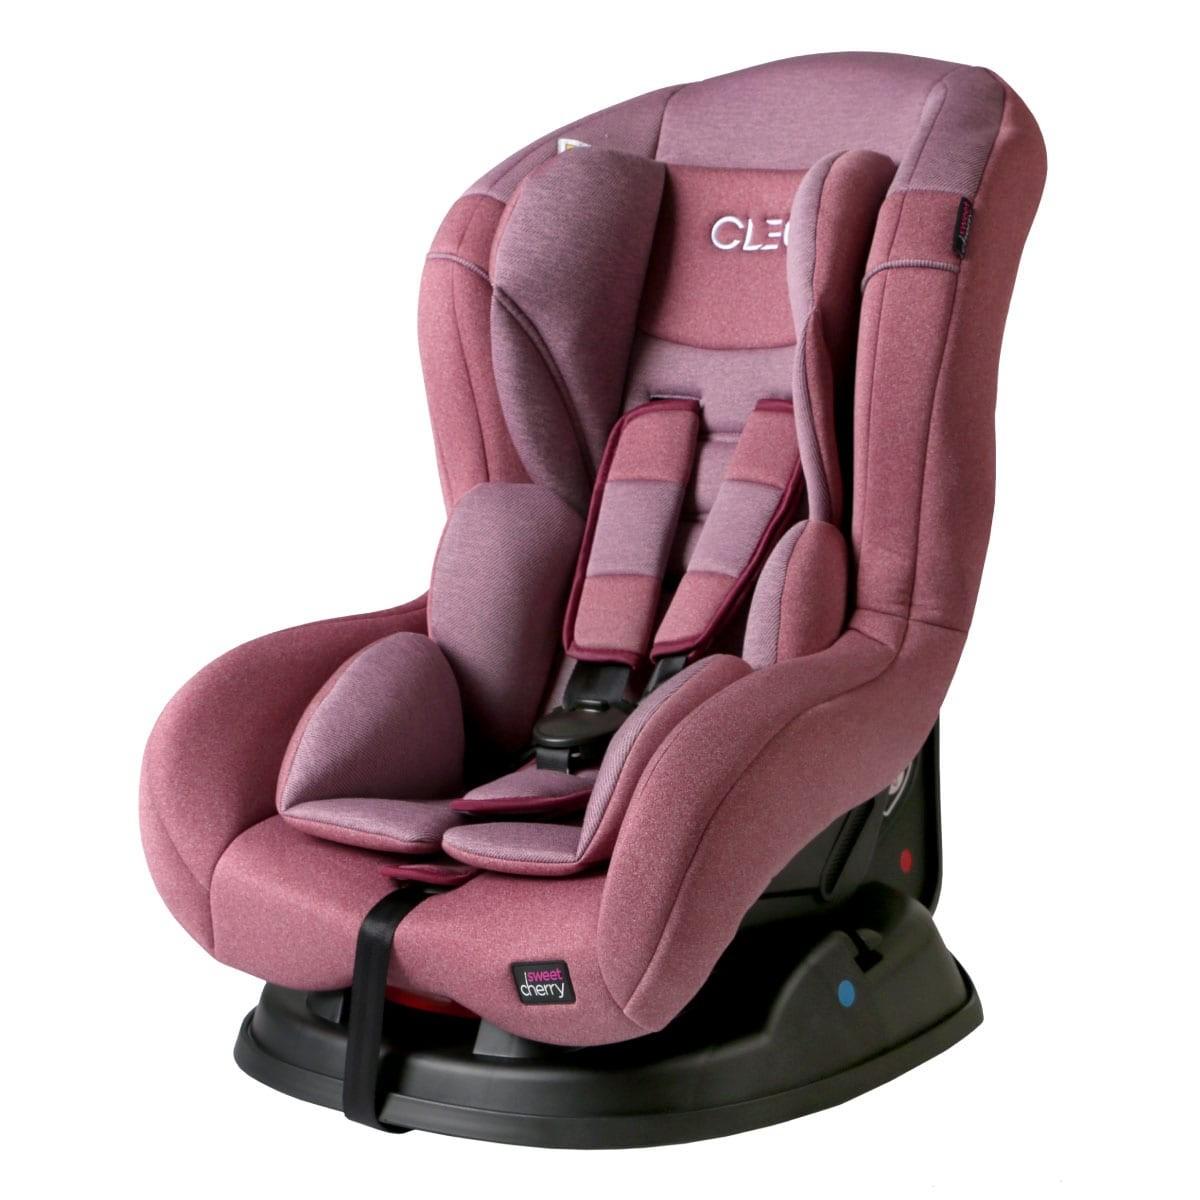 CLEO CAR SEAT - Kico Baby Center